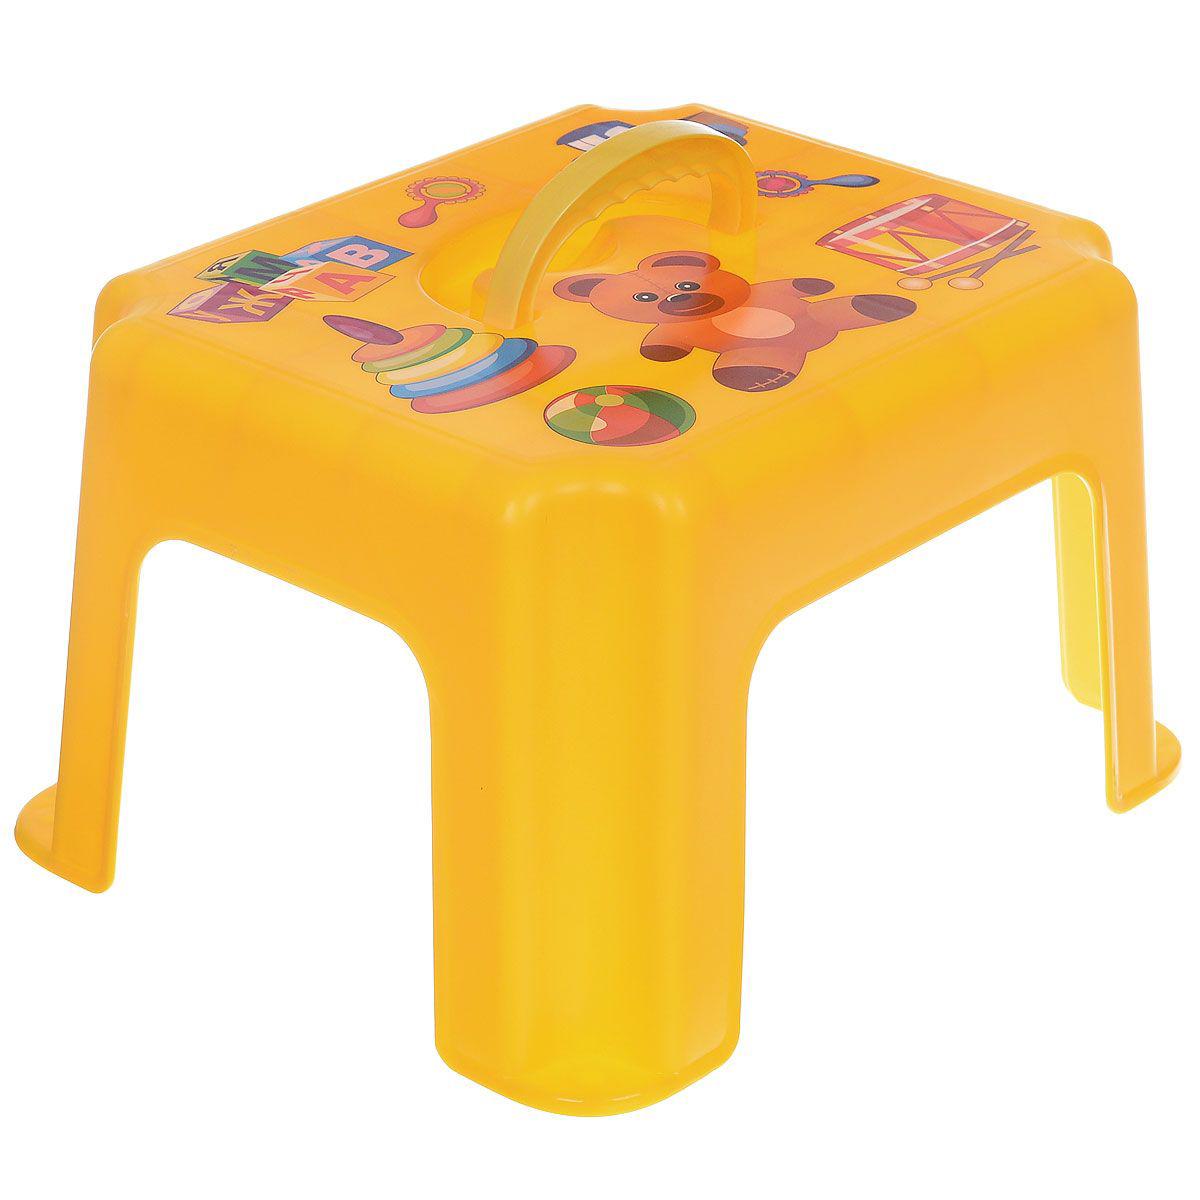 Табурет-подставка, жёлтый